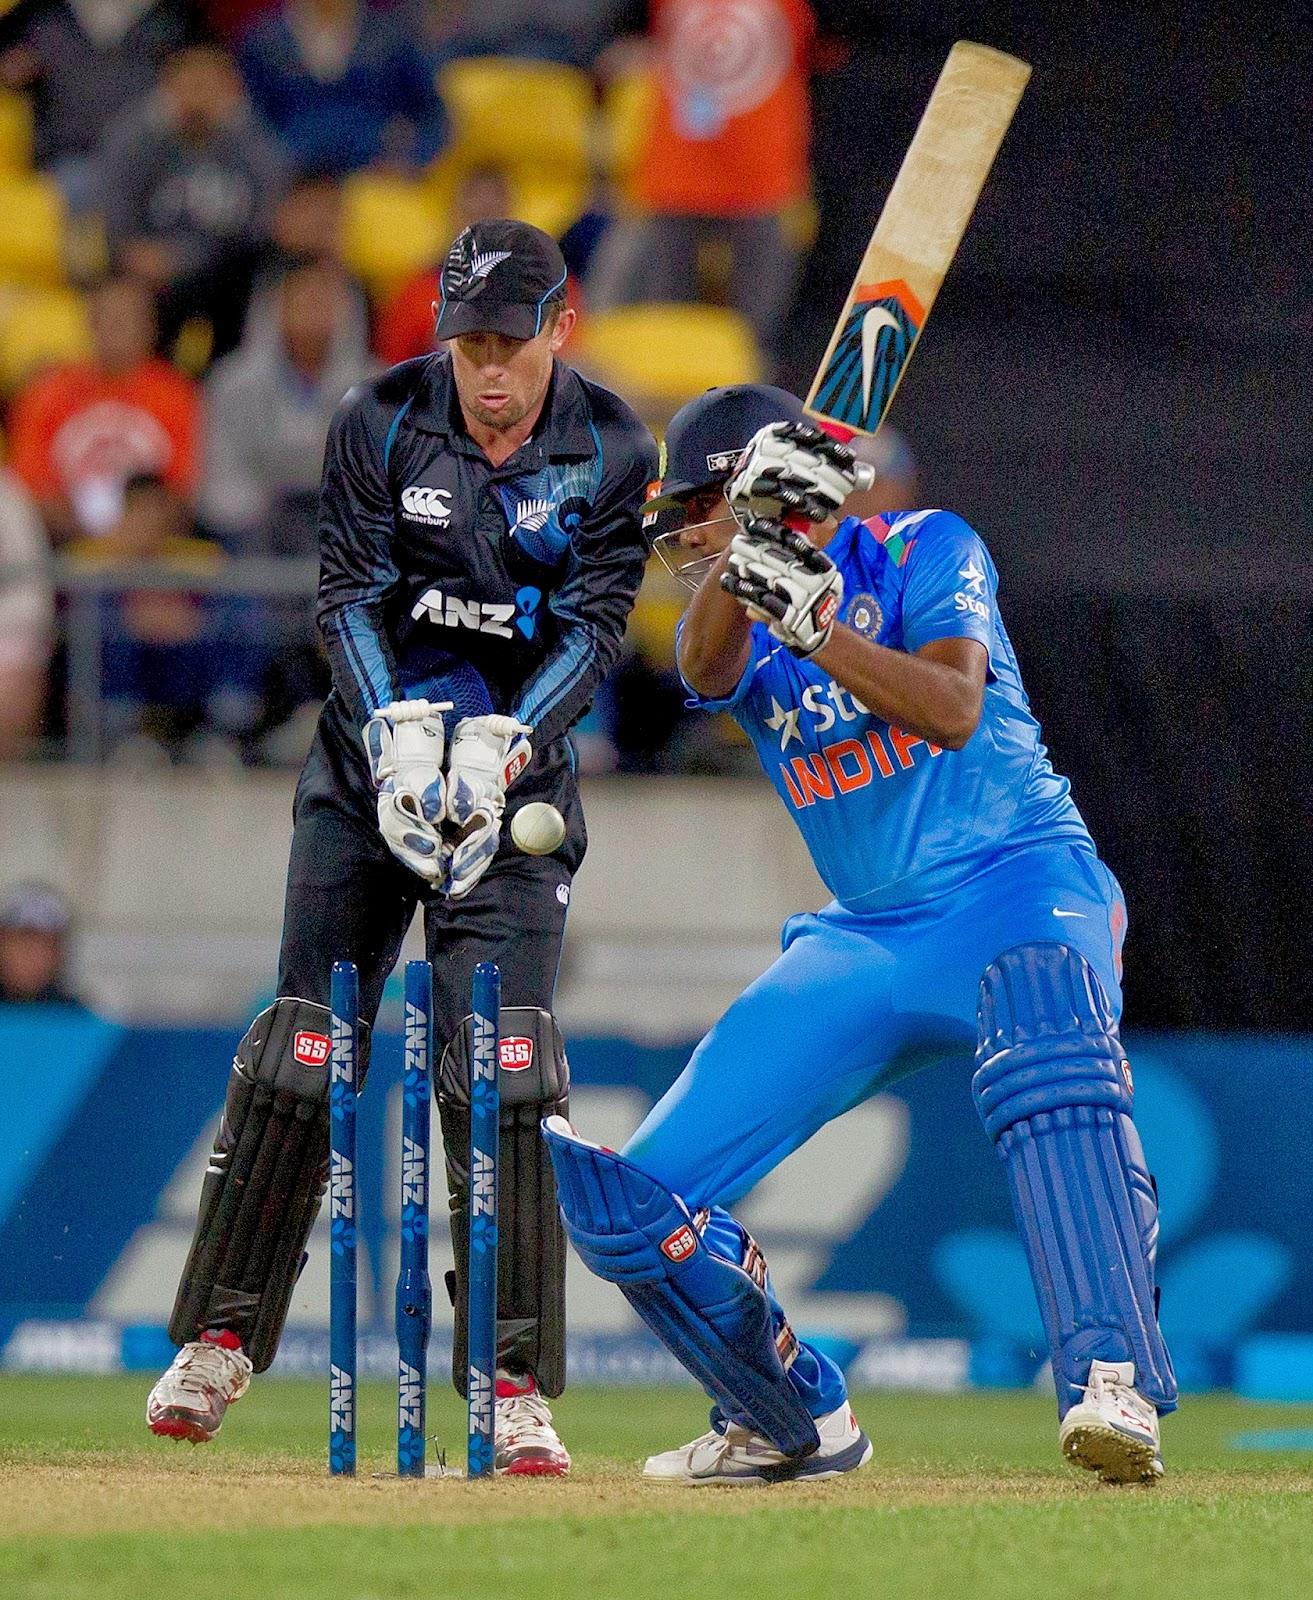 Series, Sports, Cricket, New Zealand, India, Team, ODIs, 2014, Trophy, Stadium, Brendon McCullum, Captain, Ross Taylor, Virat Kohli, Ashwin, Ronchi, McLean Park, Tour, Match,